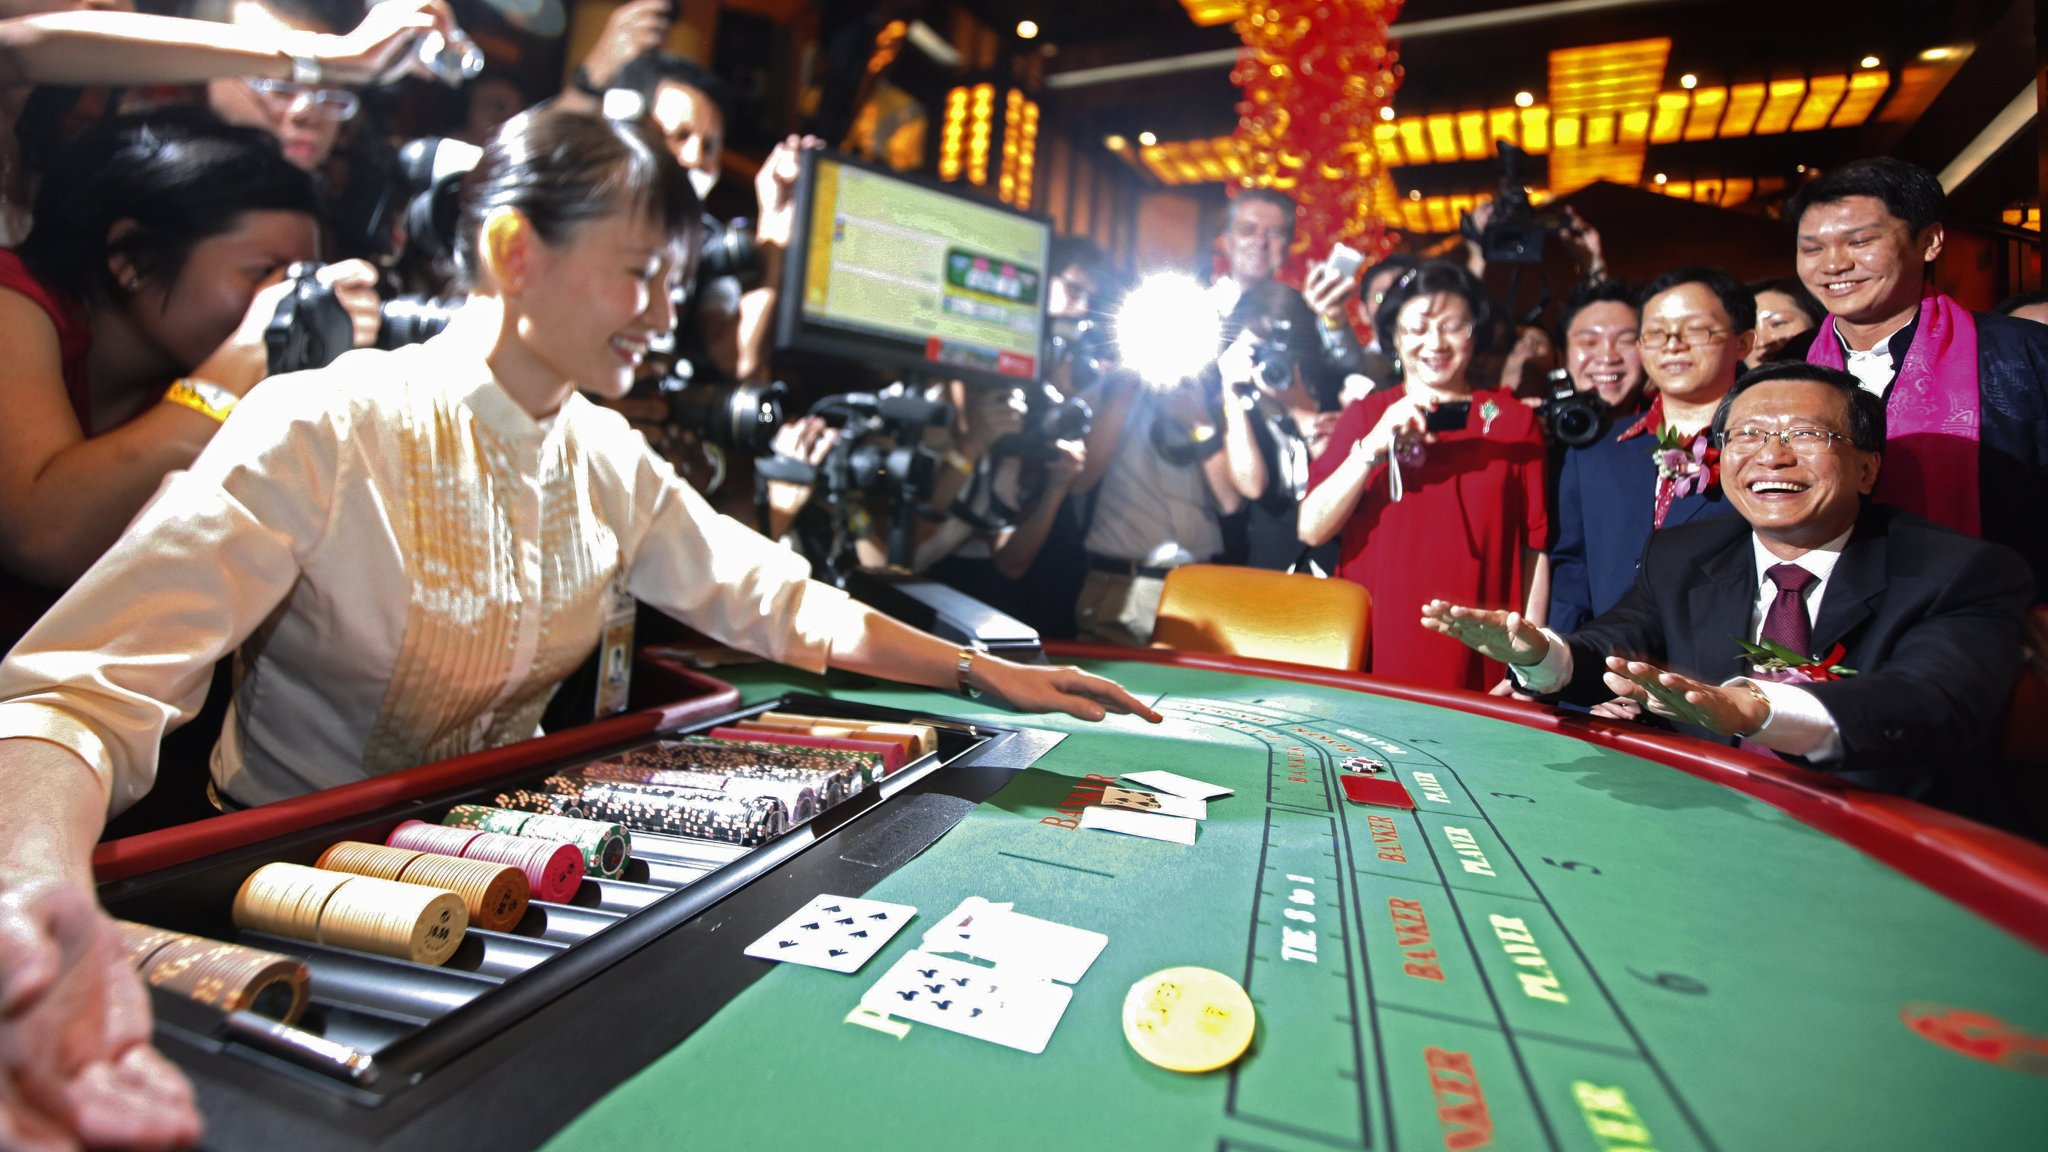 Poker in casino singapore caribbean 7 casino